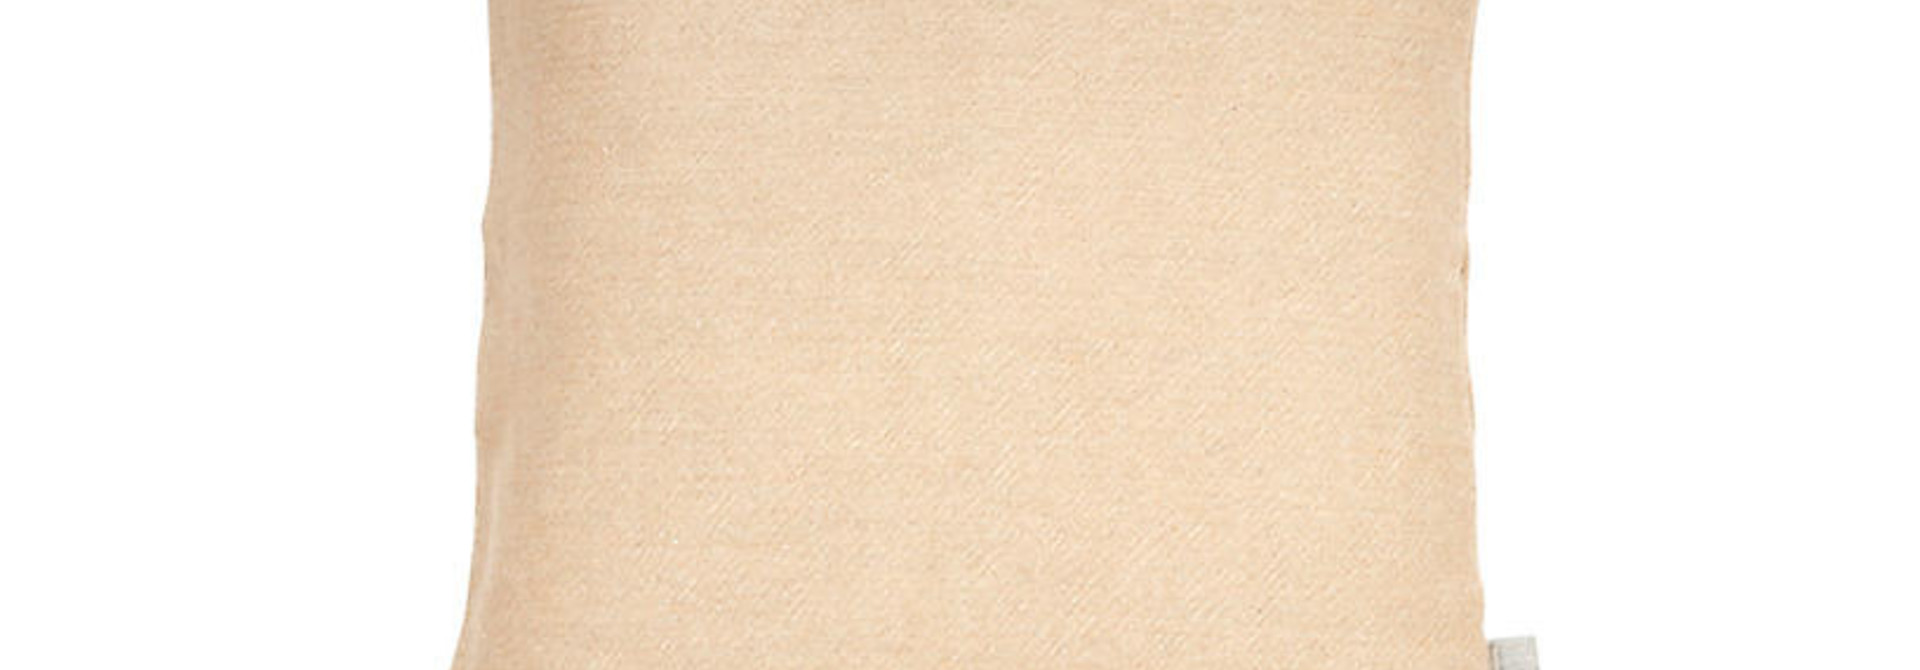 Cushion Cover - Shetland - Camel  - Set of 3